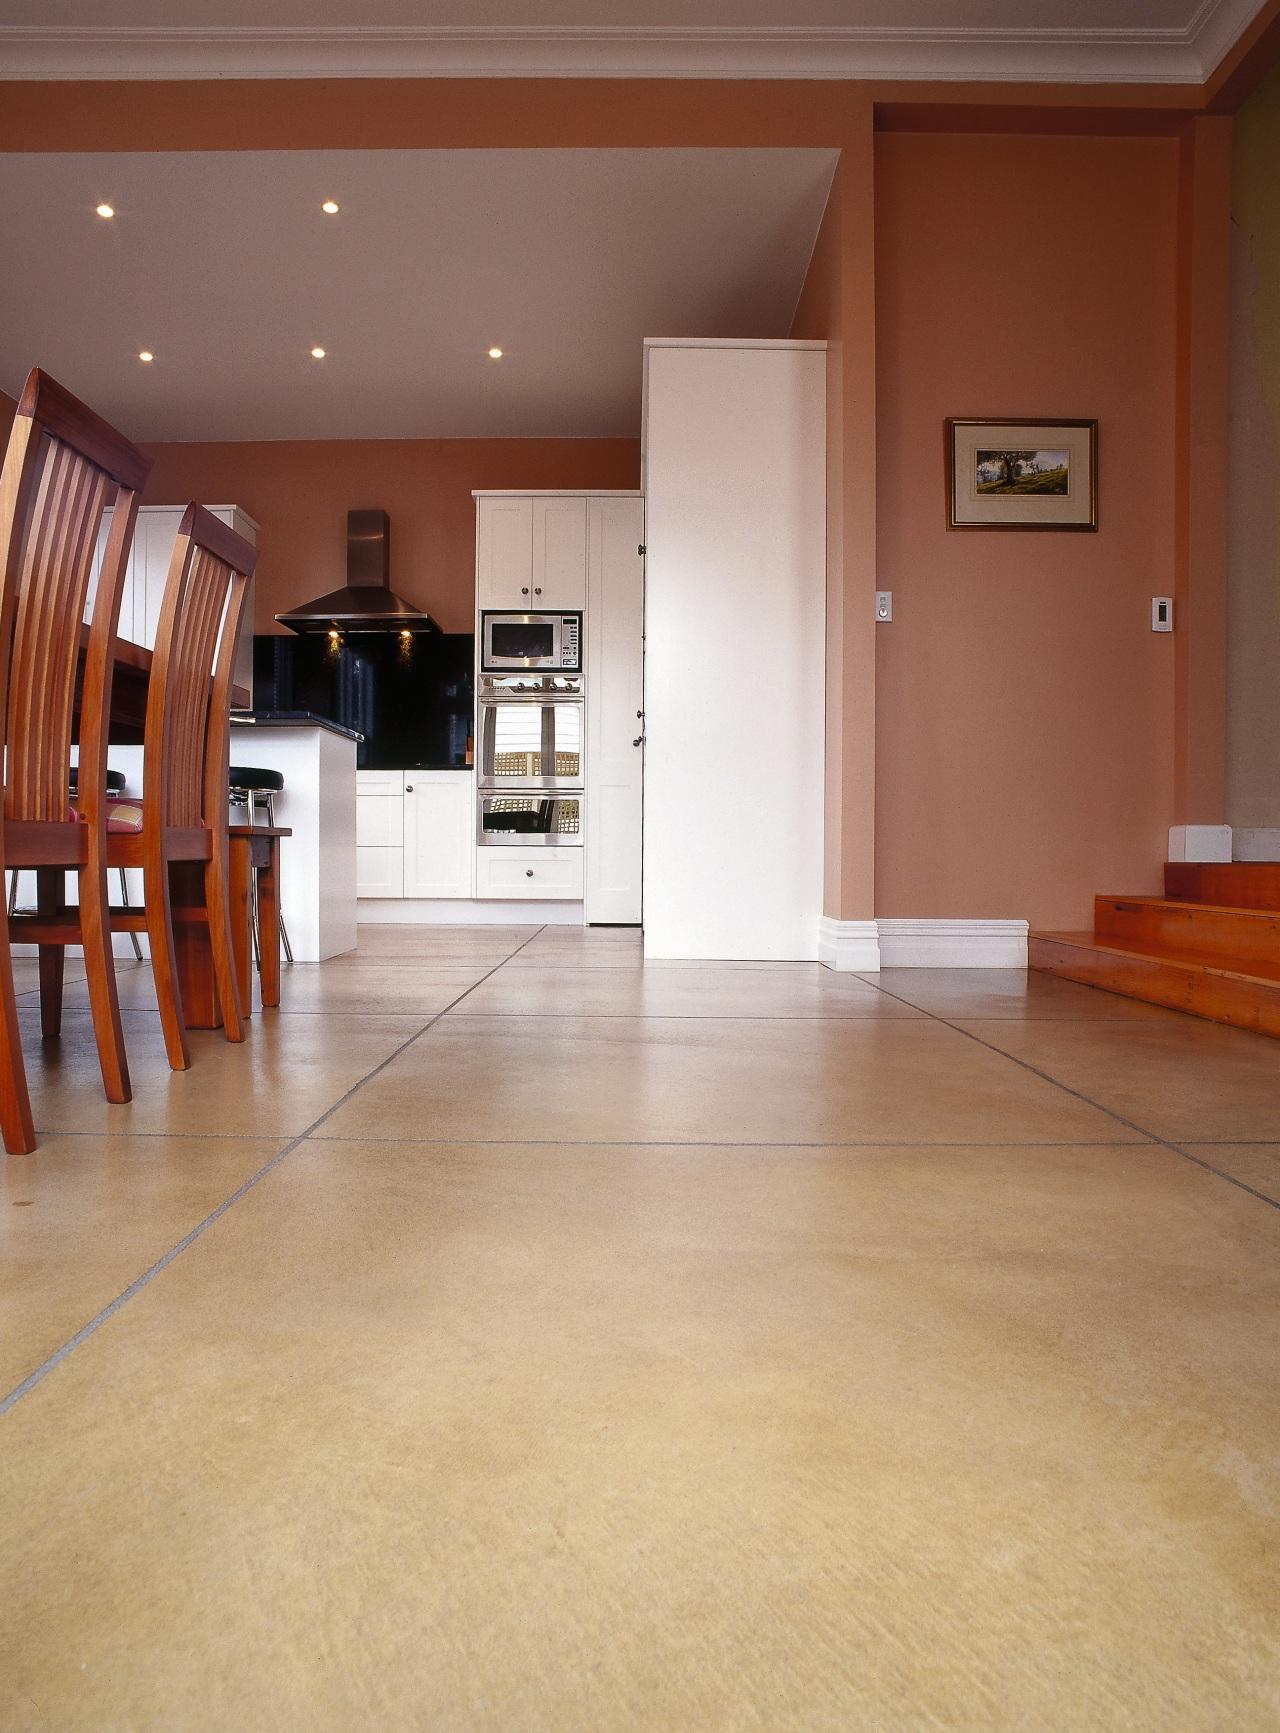 Sandstone coloured polished concrete floor laid to resemble ceiling, floor, flooring, hardwood, home, interior design, laminate flooring, lobby, real estate, tile, wood, wood flooring, brown, orange